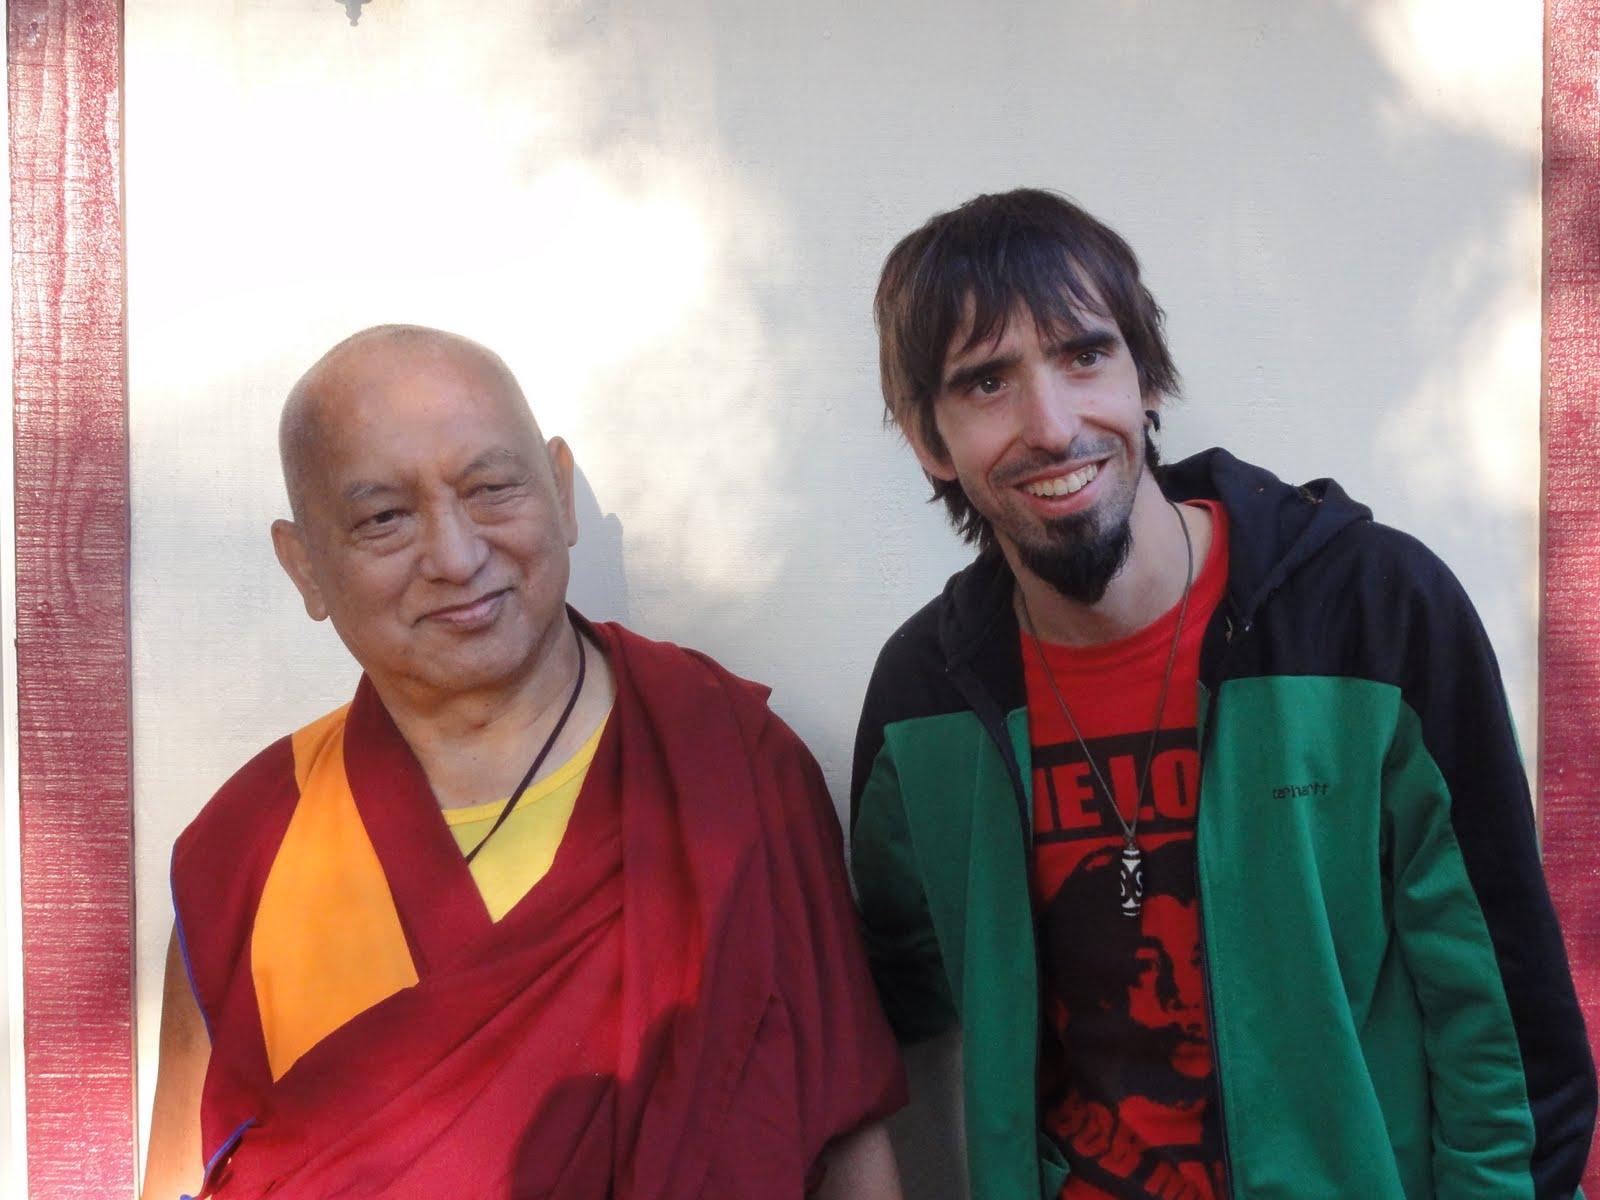 Lama Zopa Rinpoche and Tenzin Osel Hita.